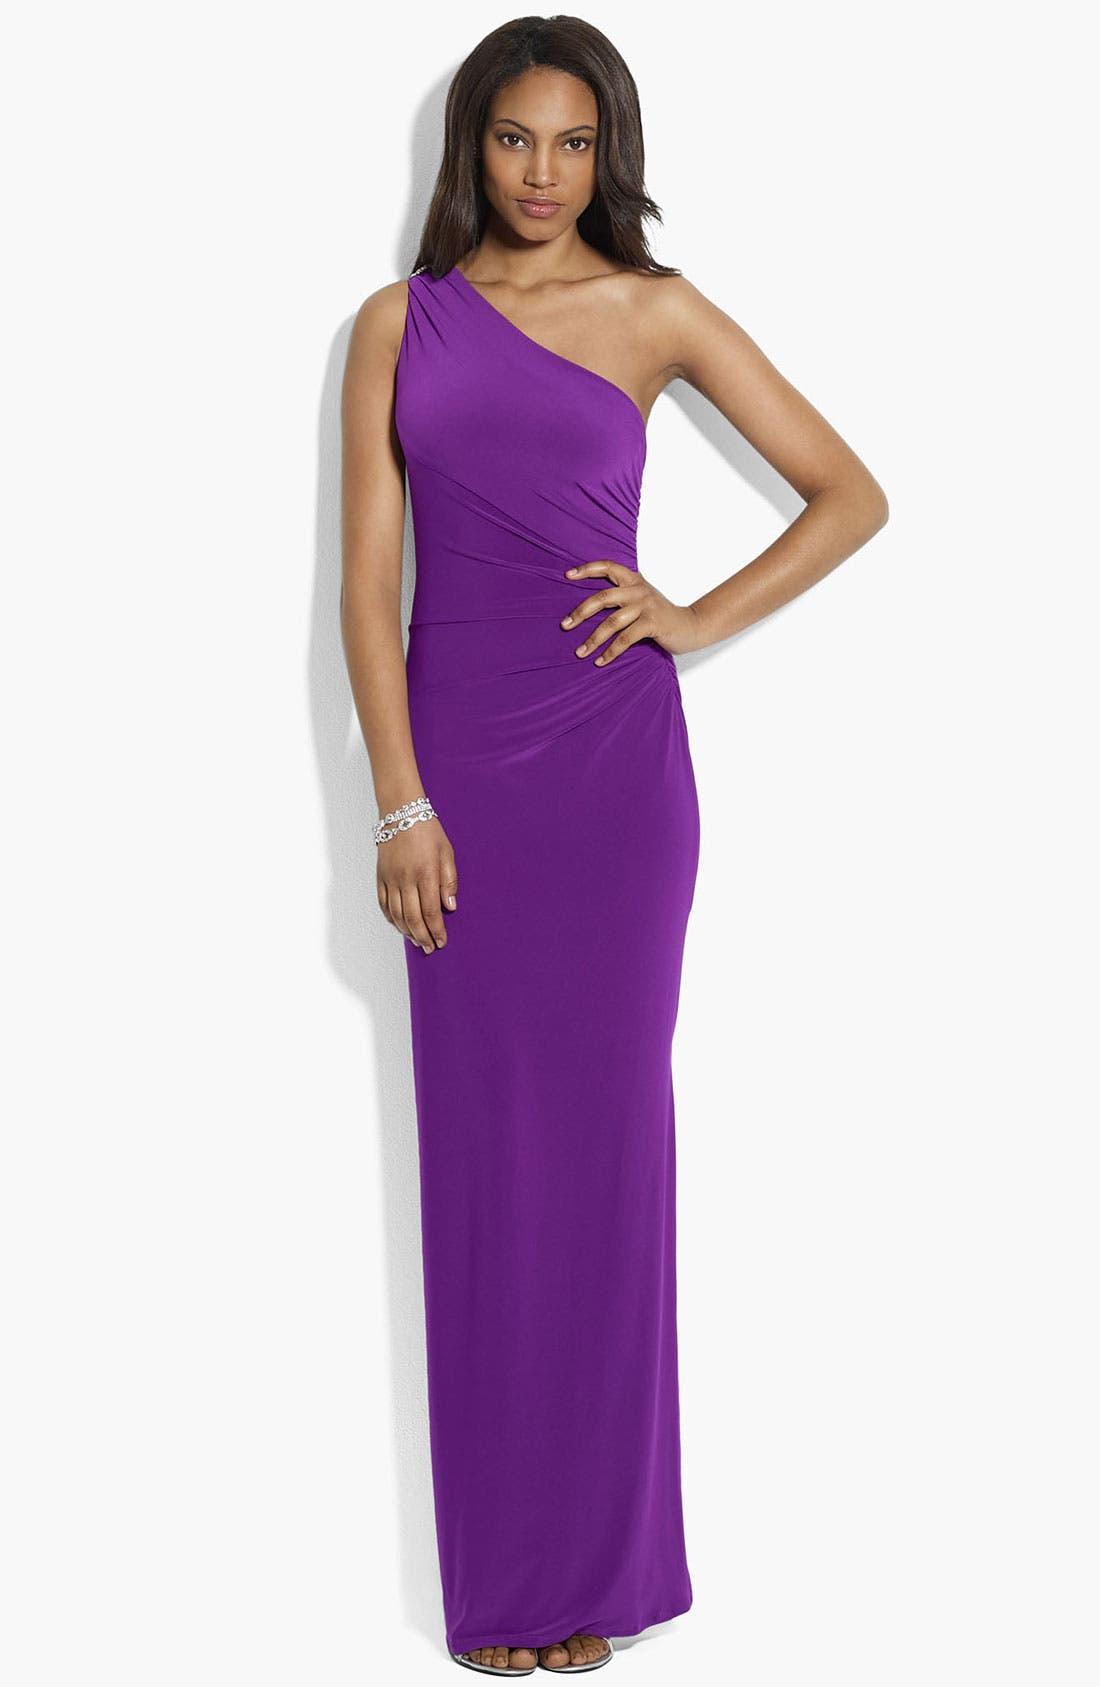 Alternate Image 1 Selected - Lauren Ralph Lauren Embellished One Shoulder Matte Jersey Gown